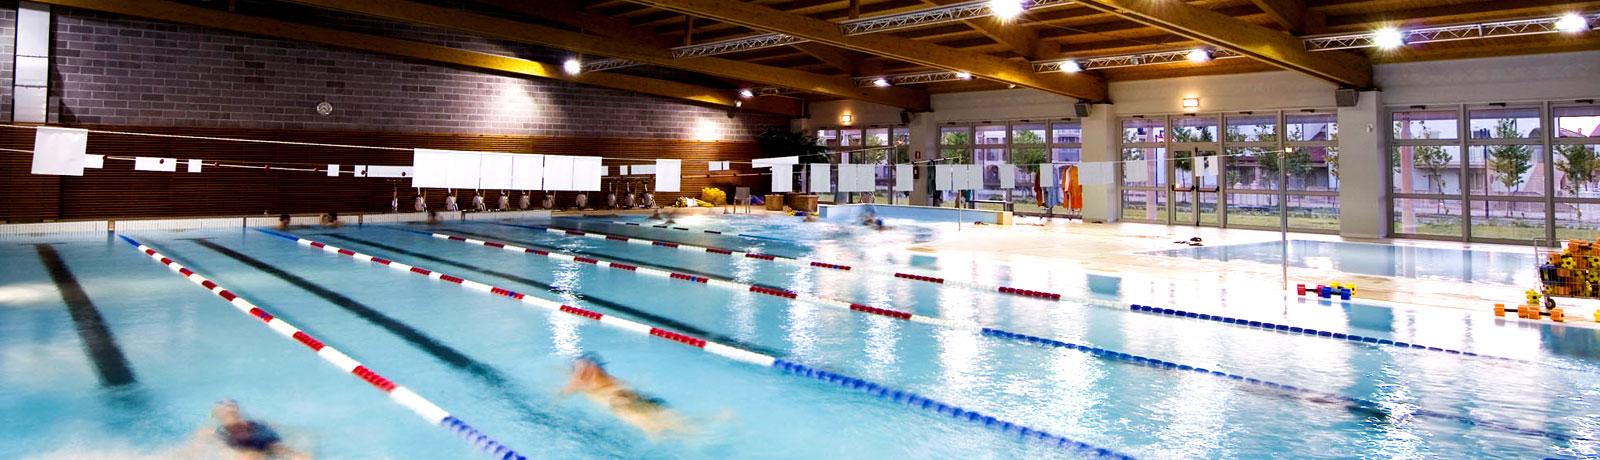 gelso piscina